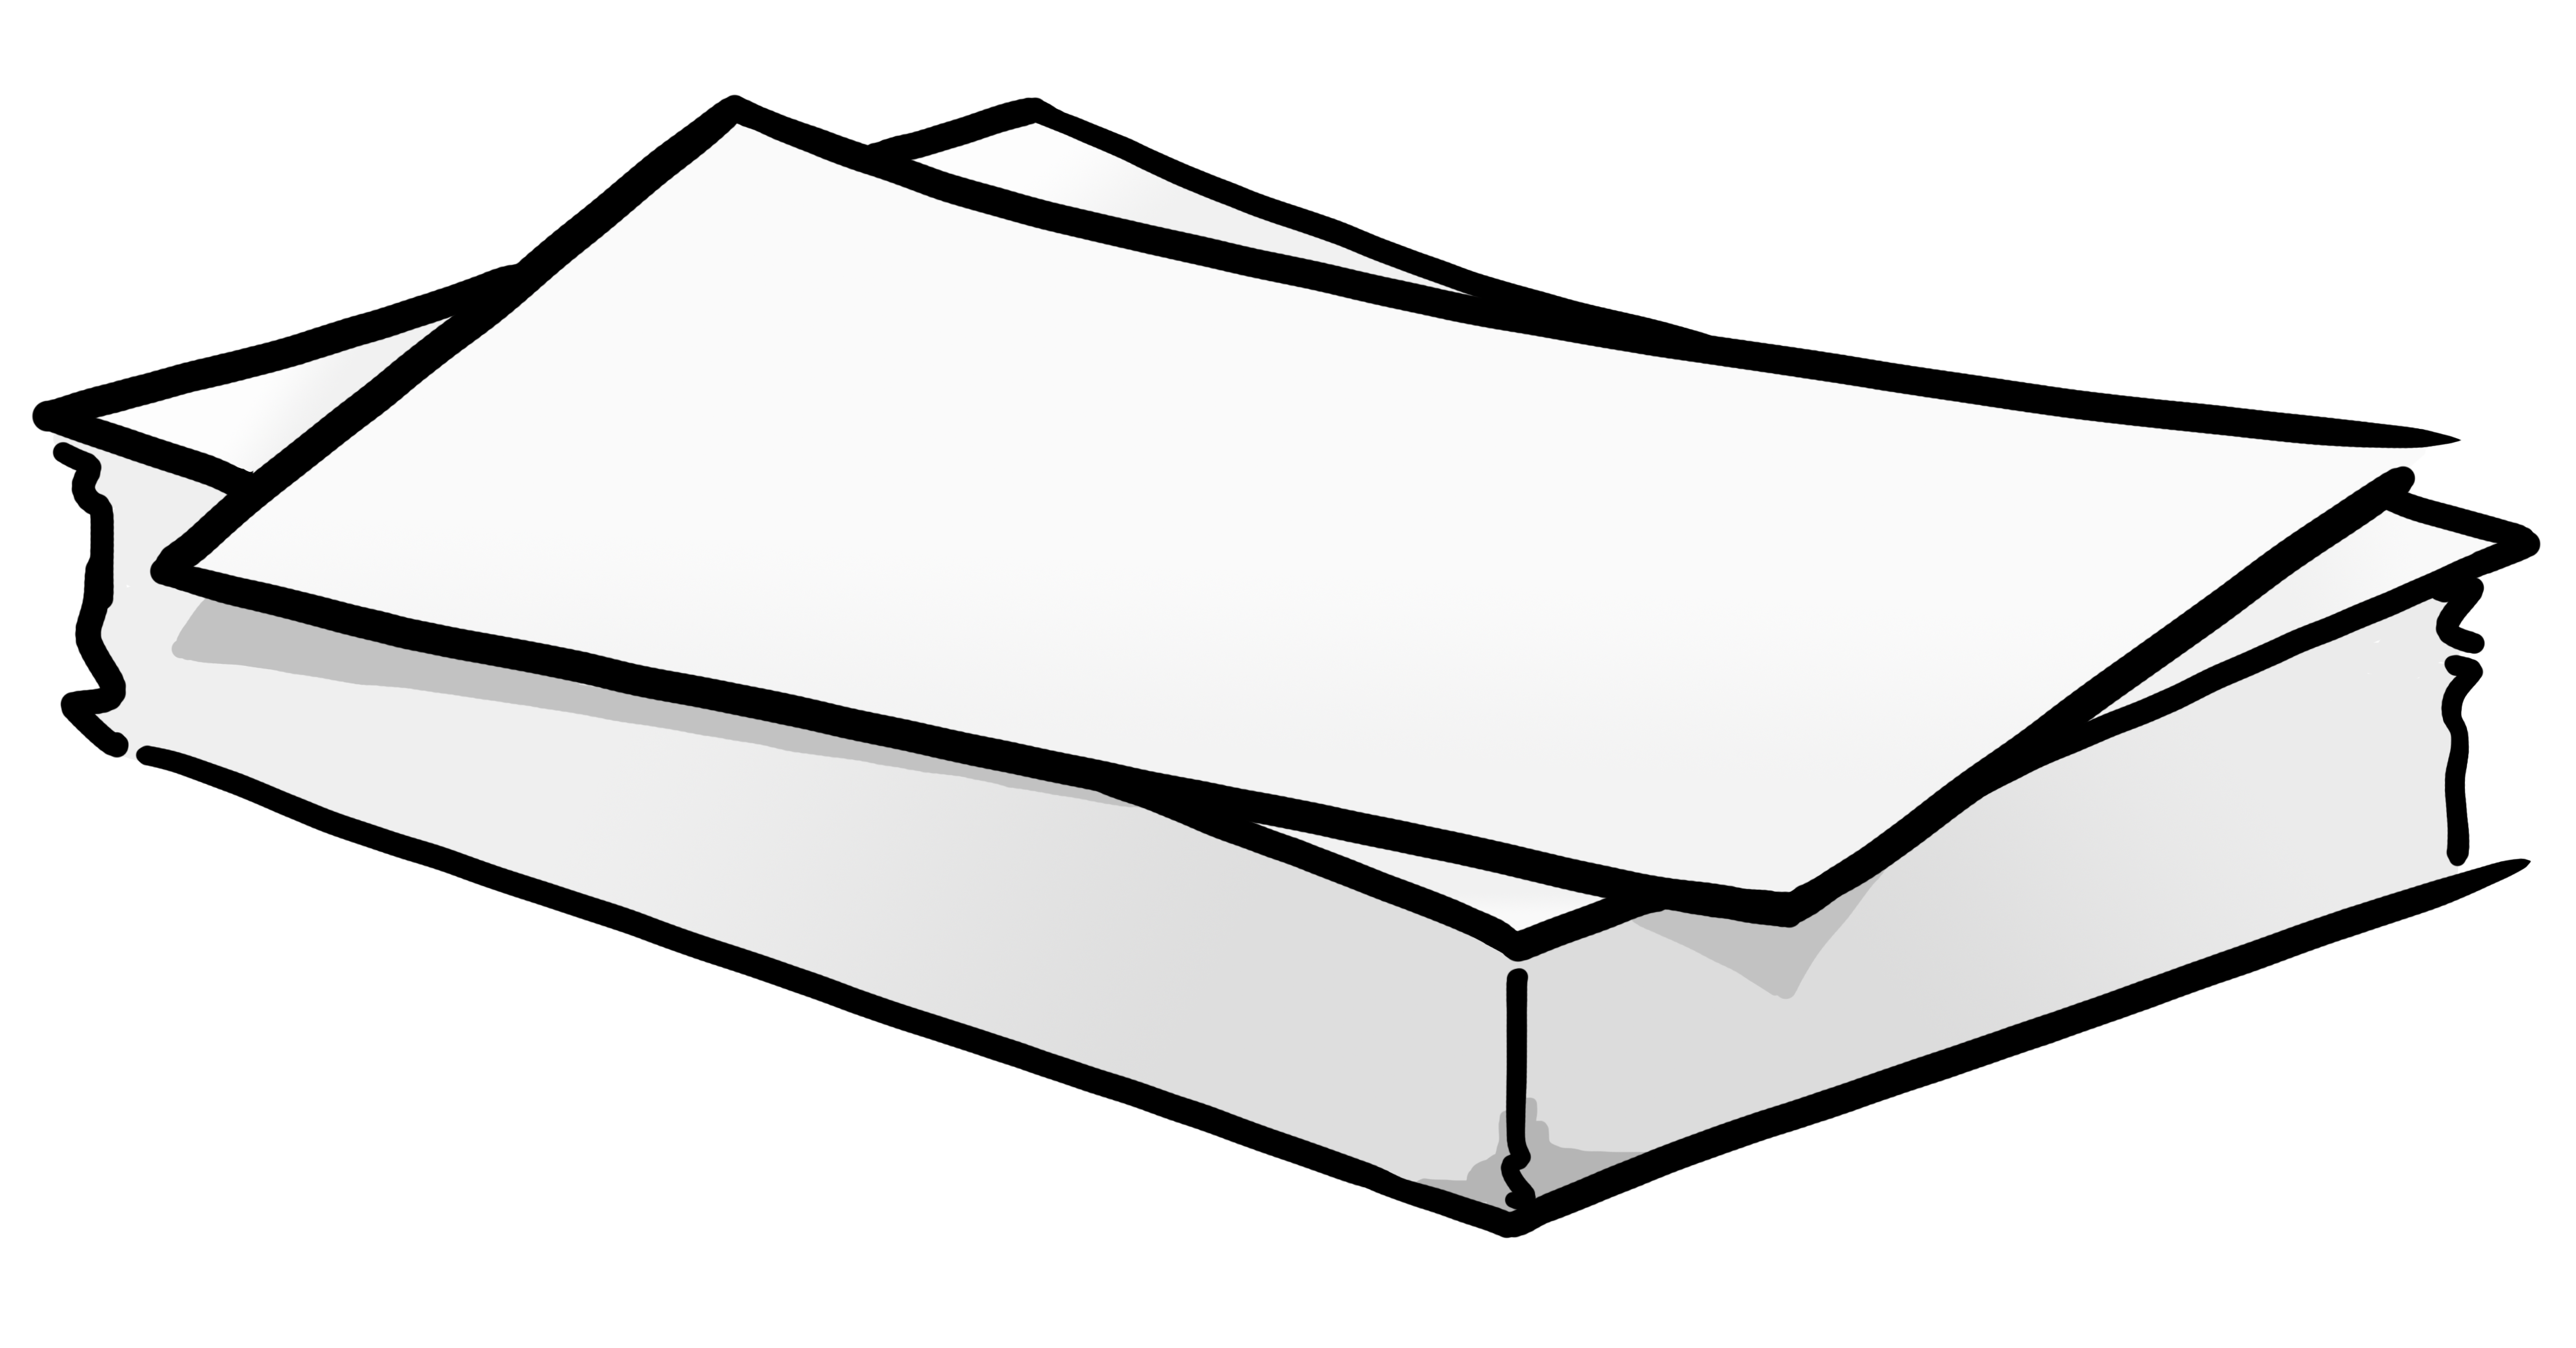 Scratch paper clipart graphic free 23+ Clip Art Paper | ClipartLook graphic free